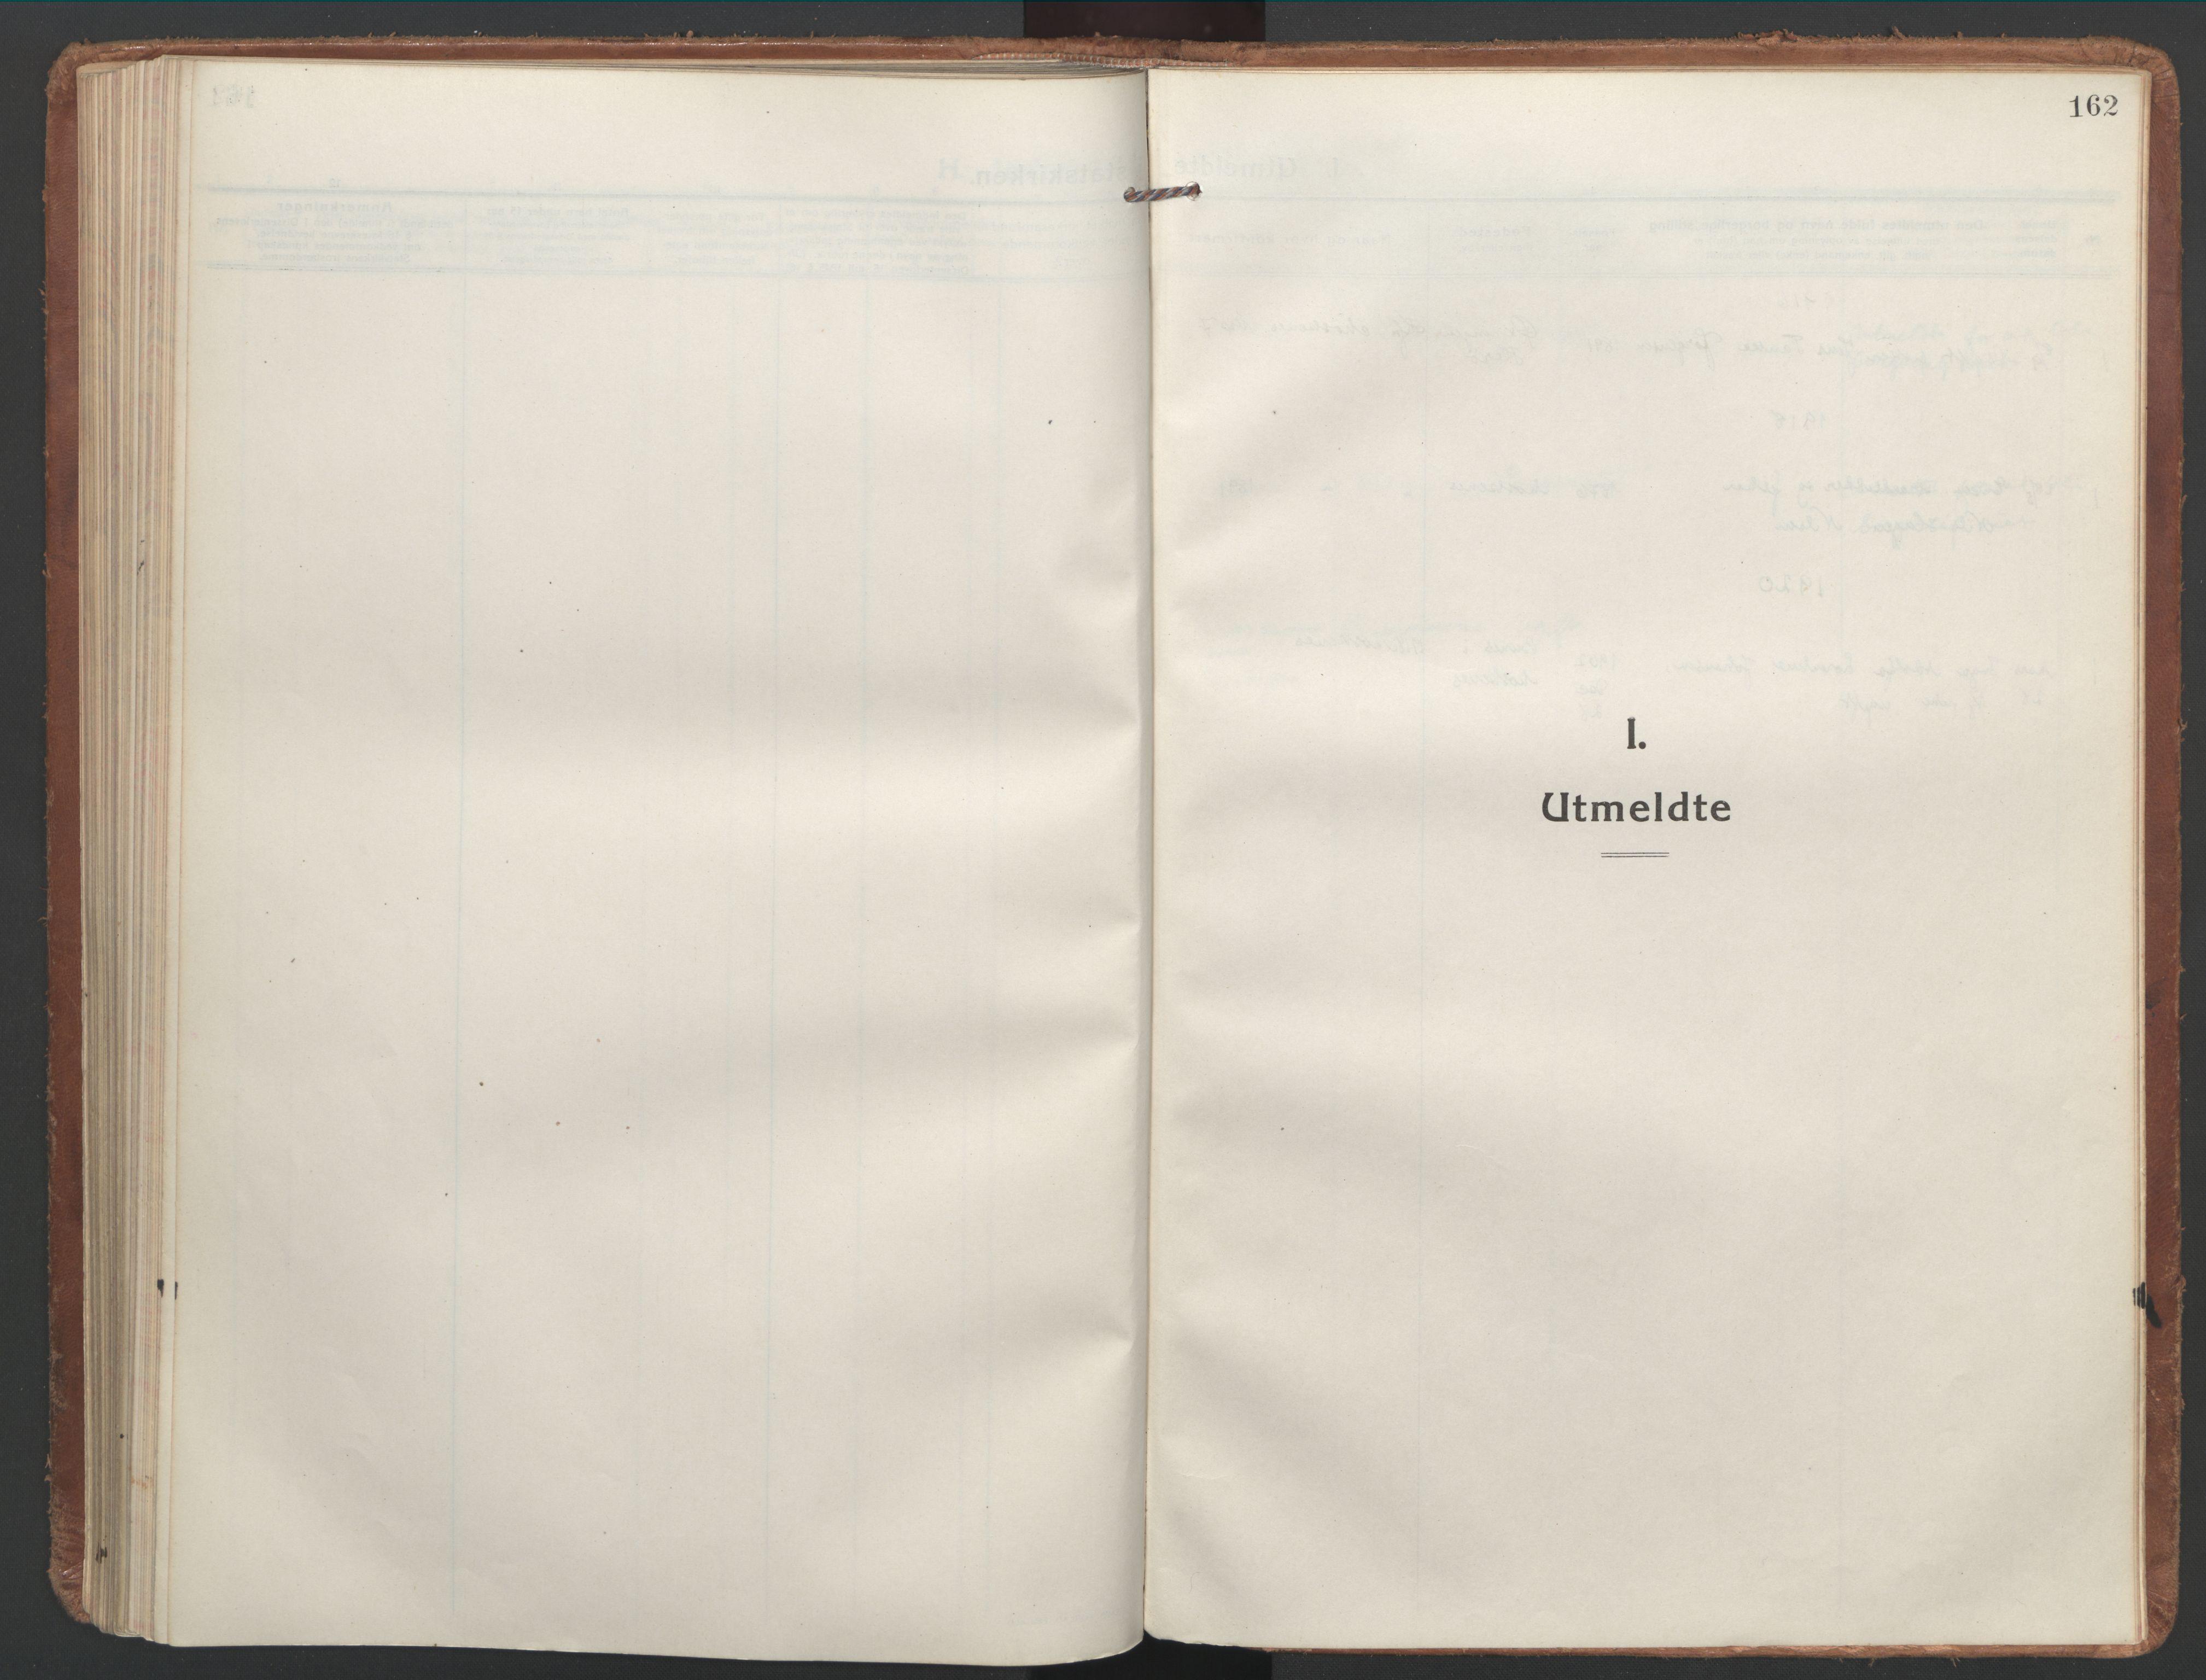 SAT, Ministerialprotokoller, klokkerbøker og fødselsregistre - Nordland, 886/L1222: Ministerialbok nr. 886A04, 1914-1926, s. 162